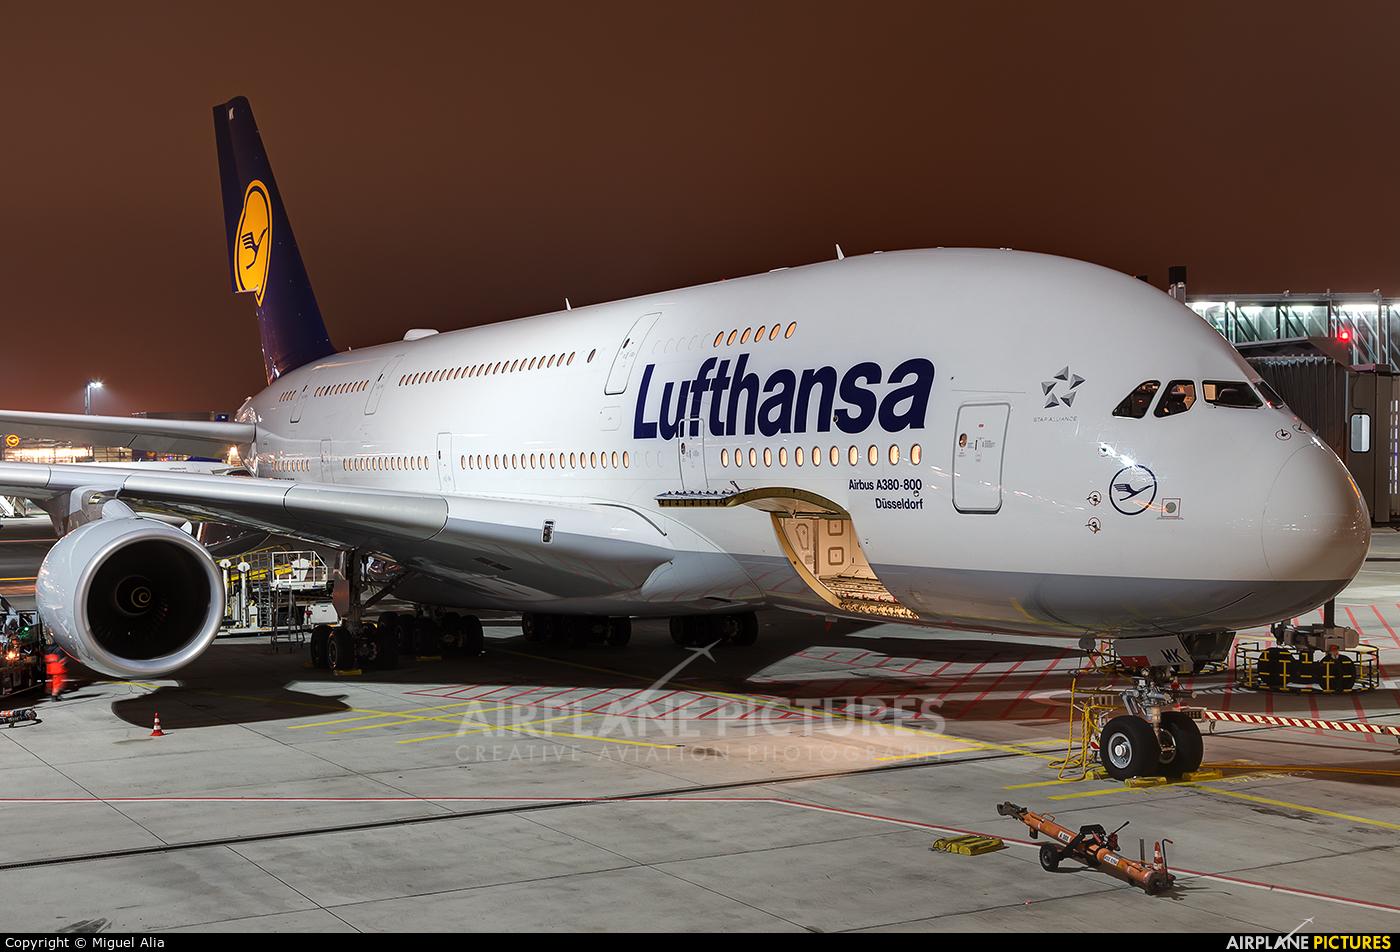 Lufthansa D-AIMK aircraft at Frankfurt